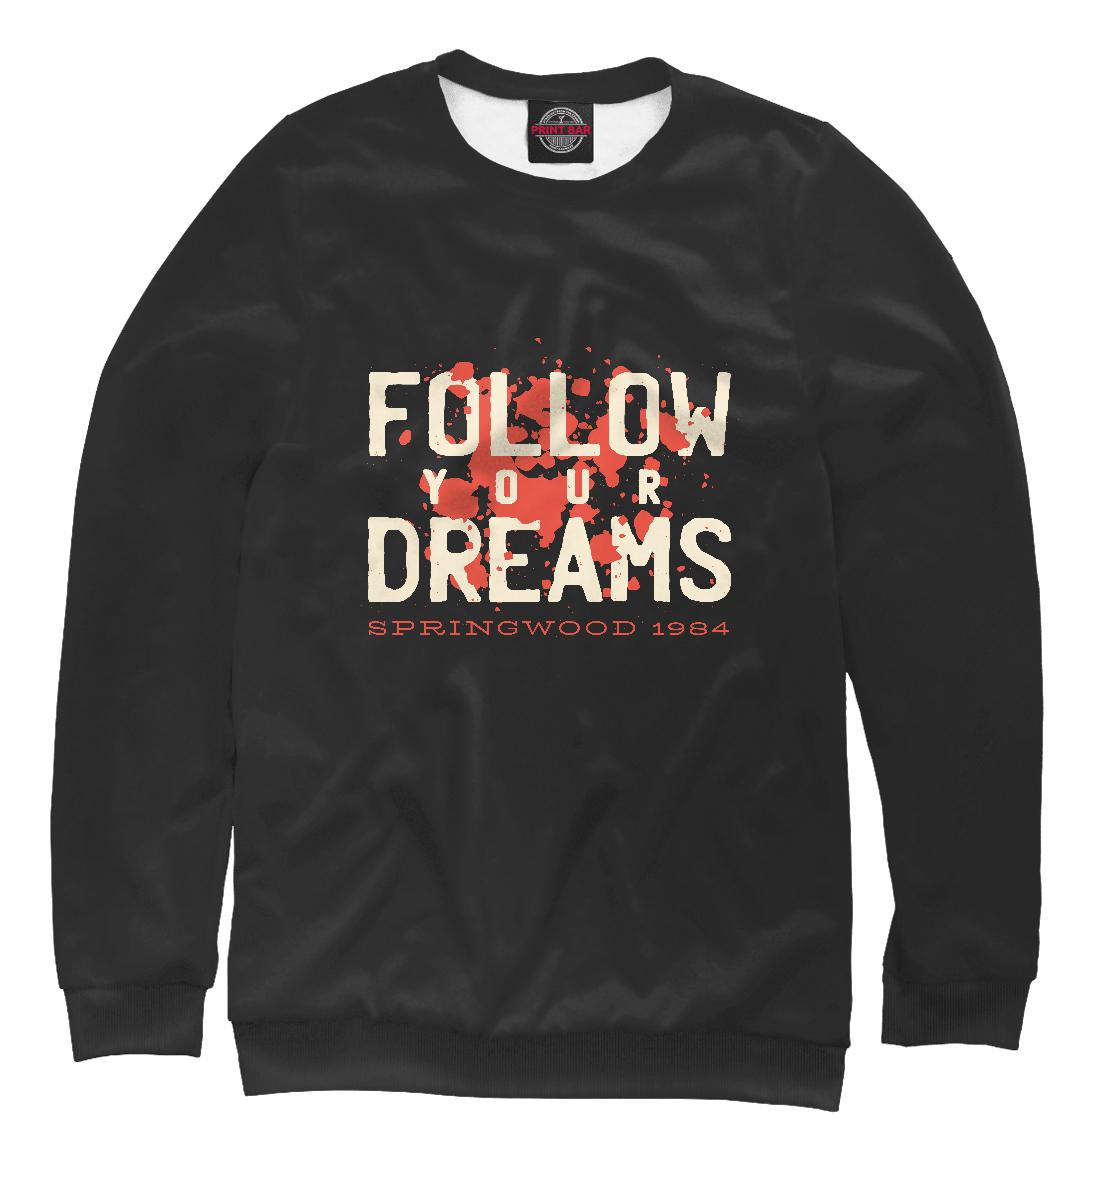 Фото - Follow your dreams printio холст 50×50 follow your dreams